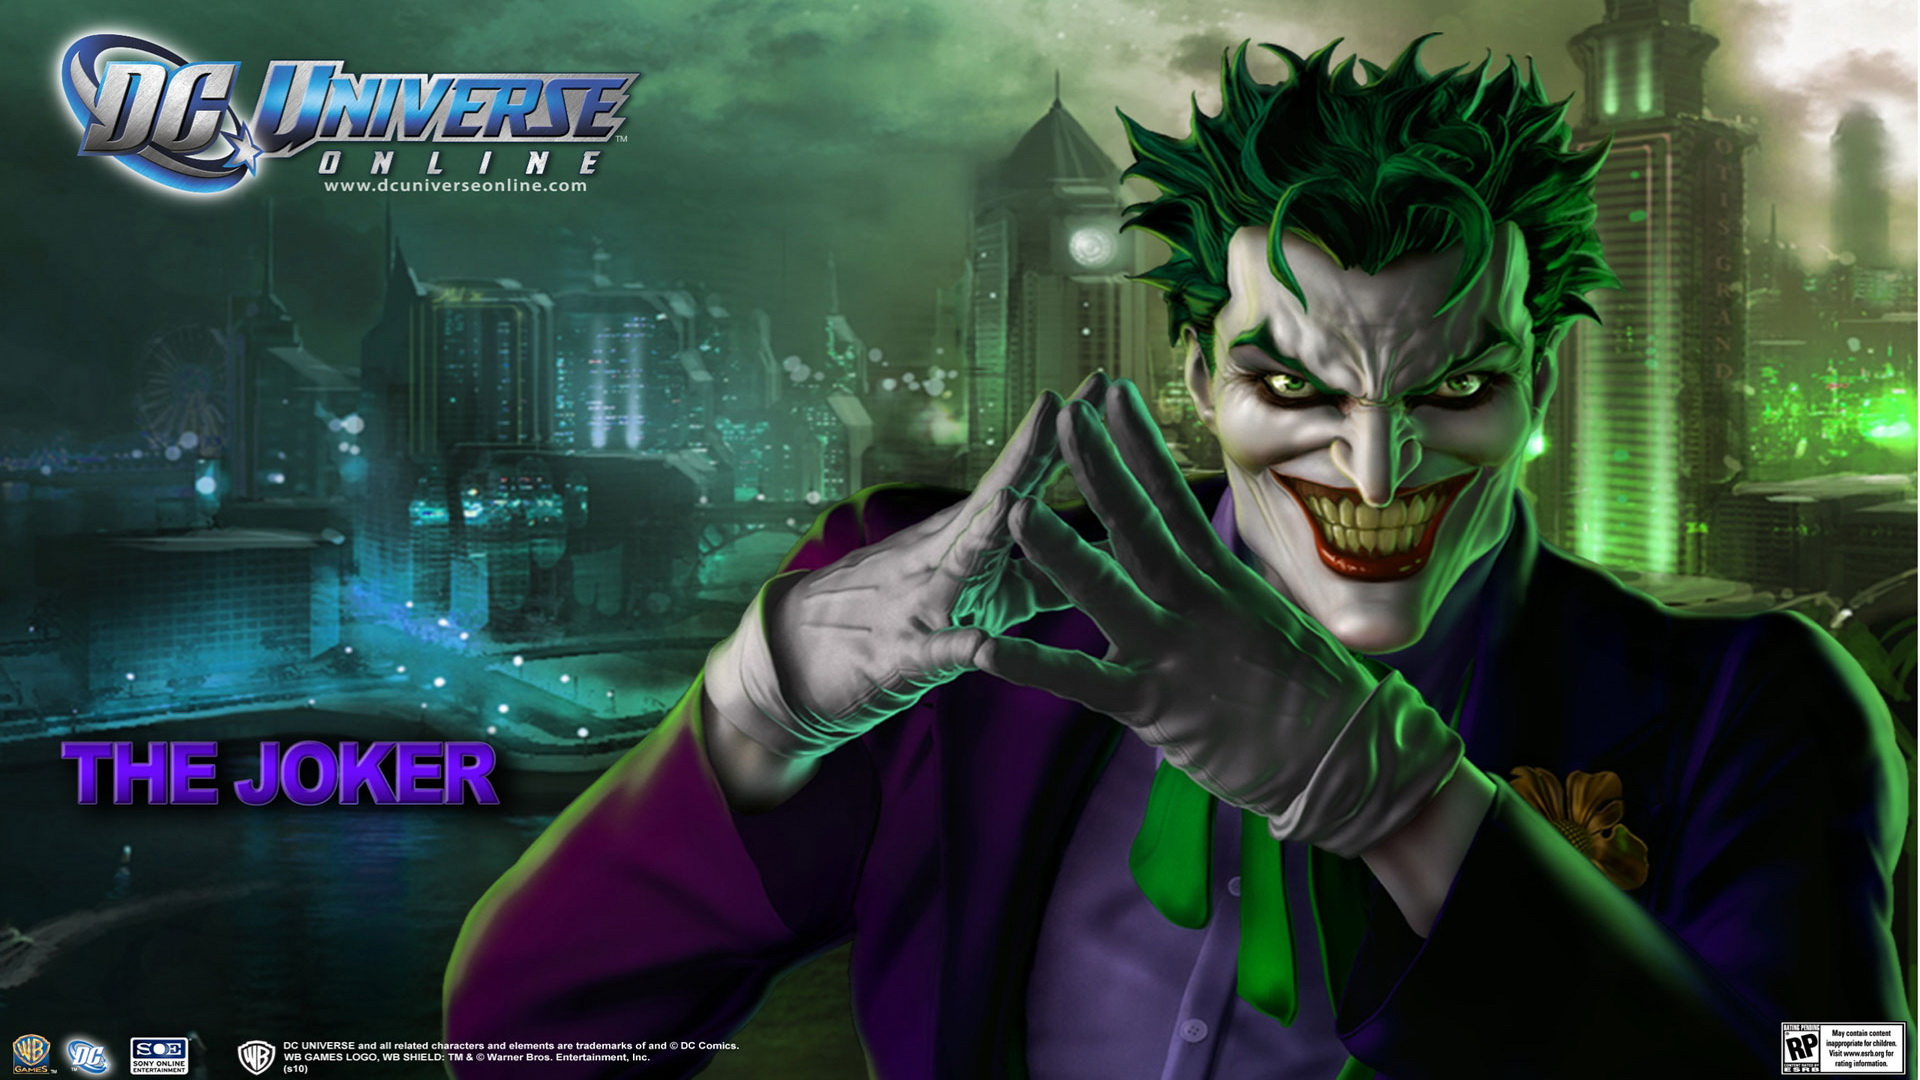 joker Wallpaper Playstation 3 Wallpapers HD 1080p Video Games 1920x1080